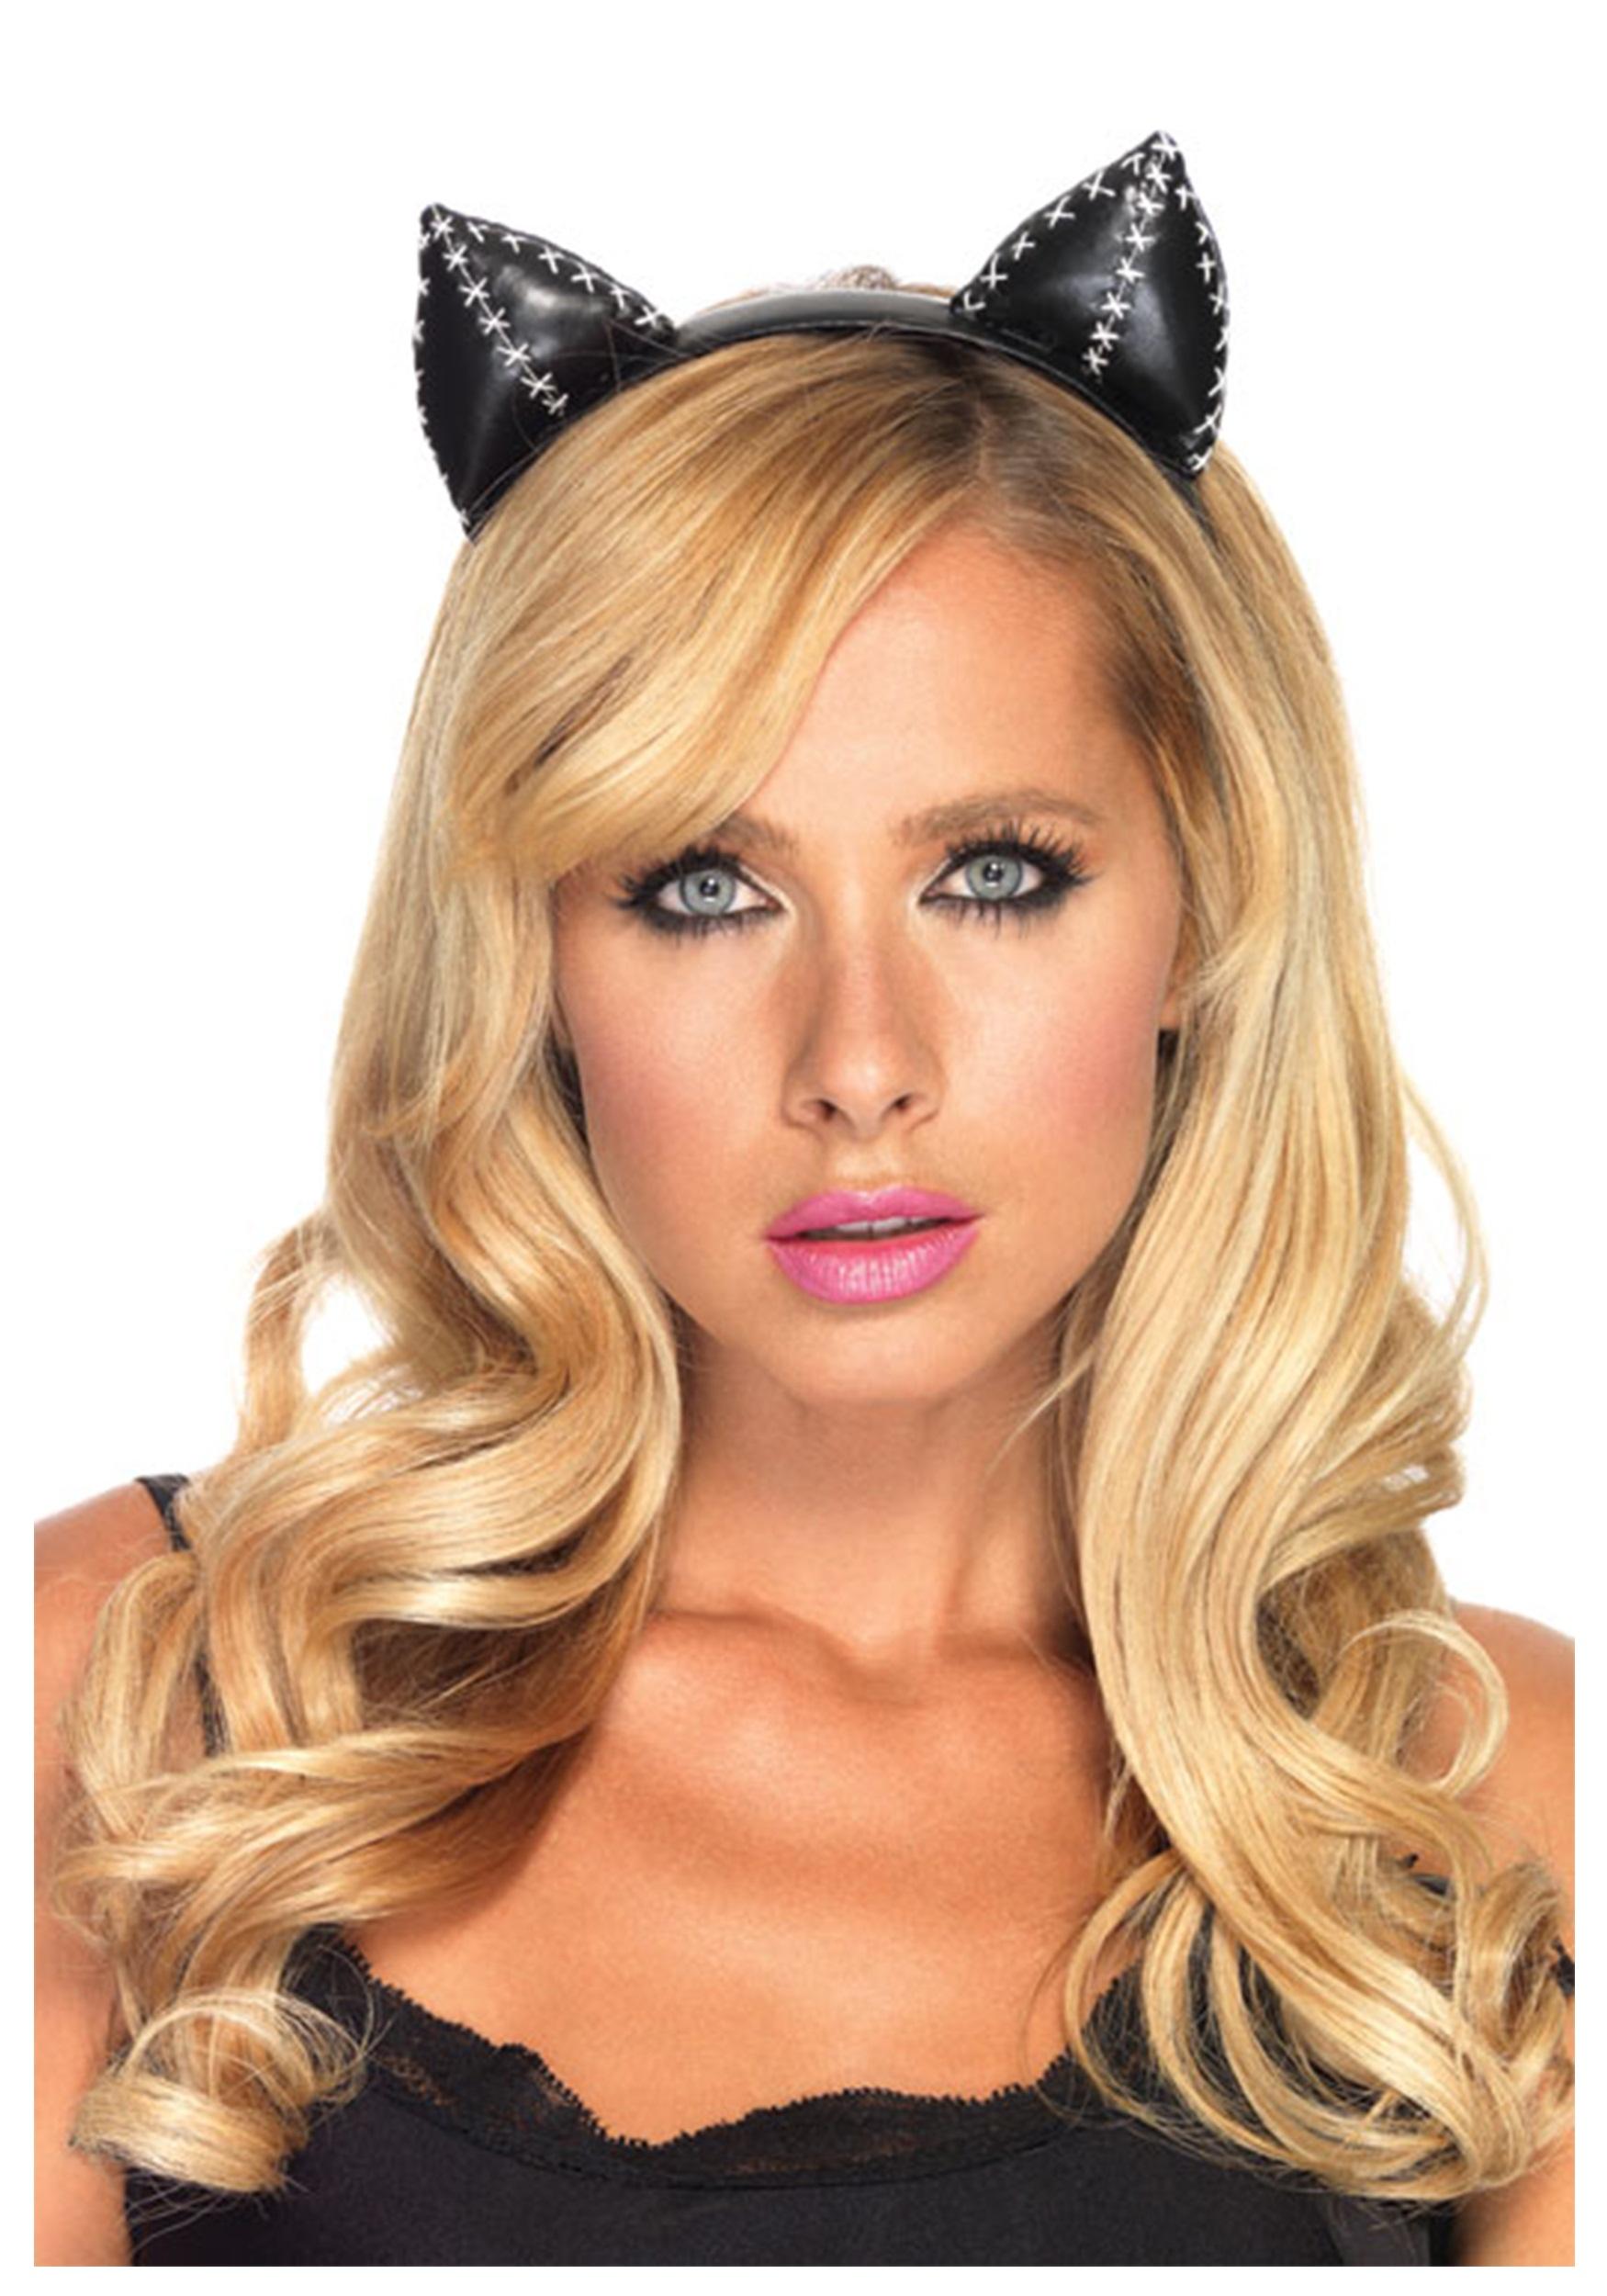 stitch-kitty-ear-headband.jpg a271333372f